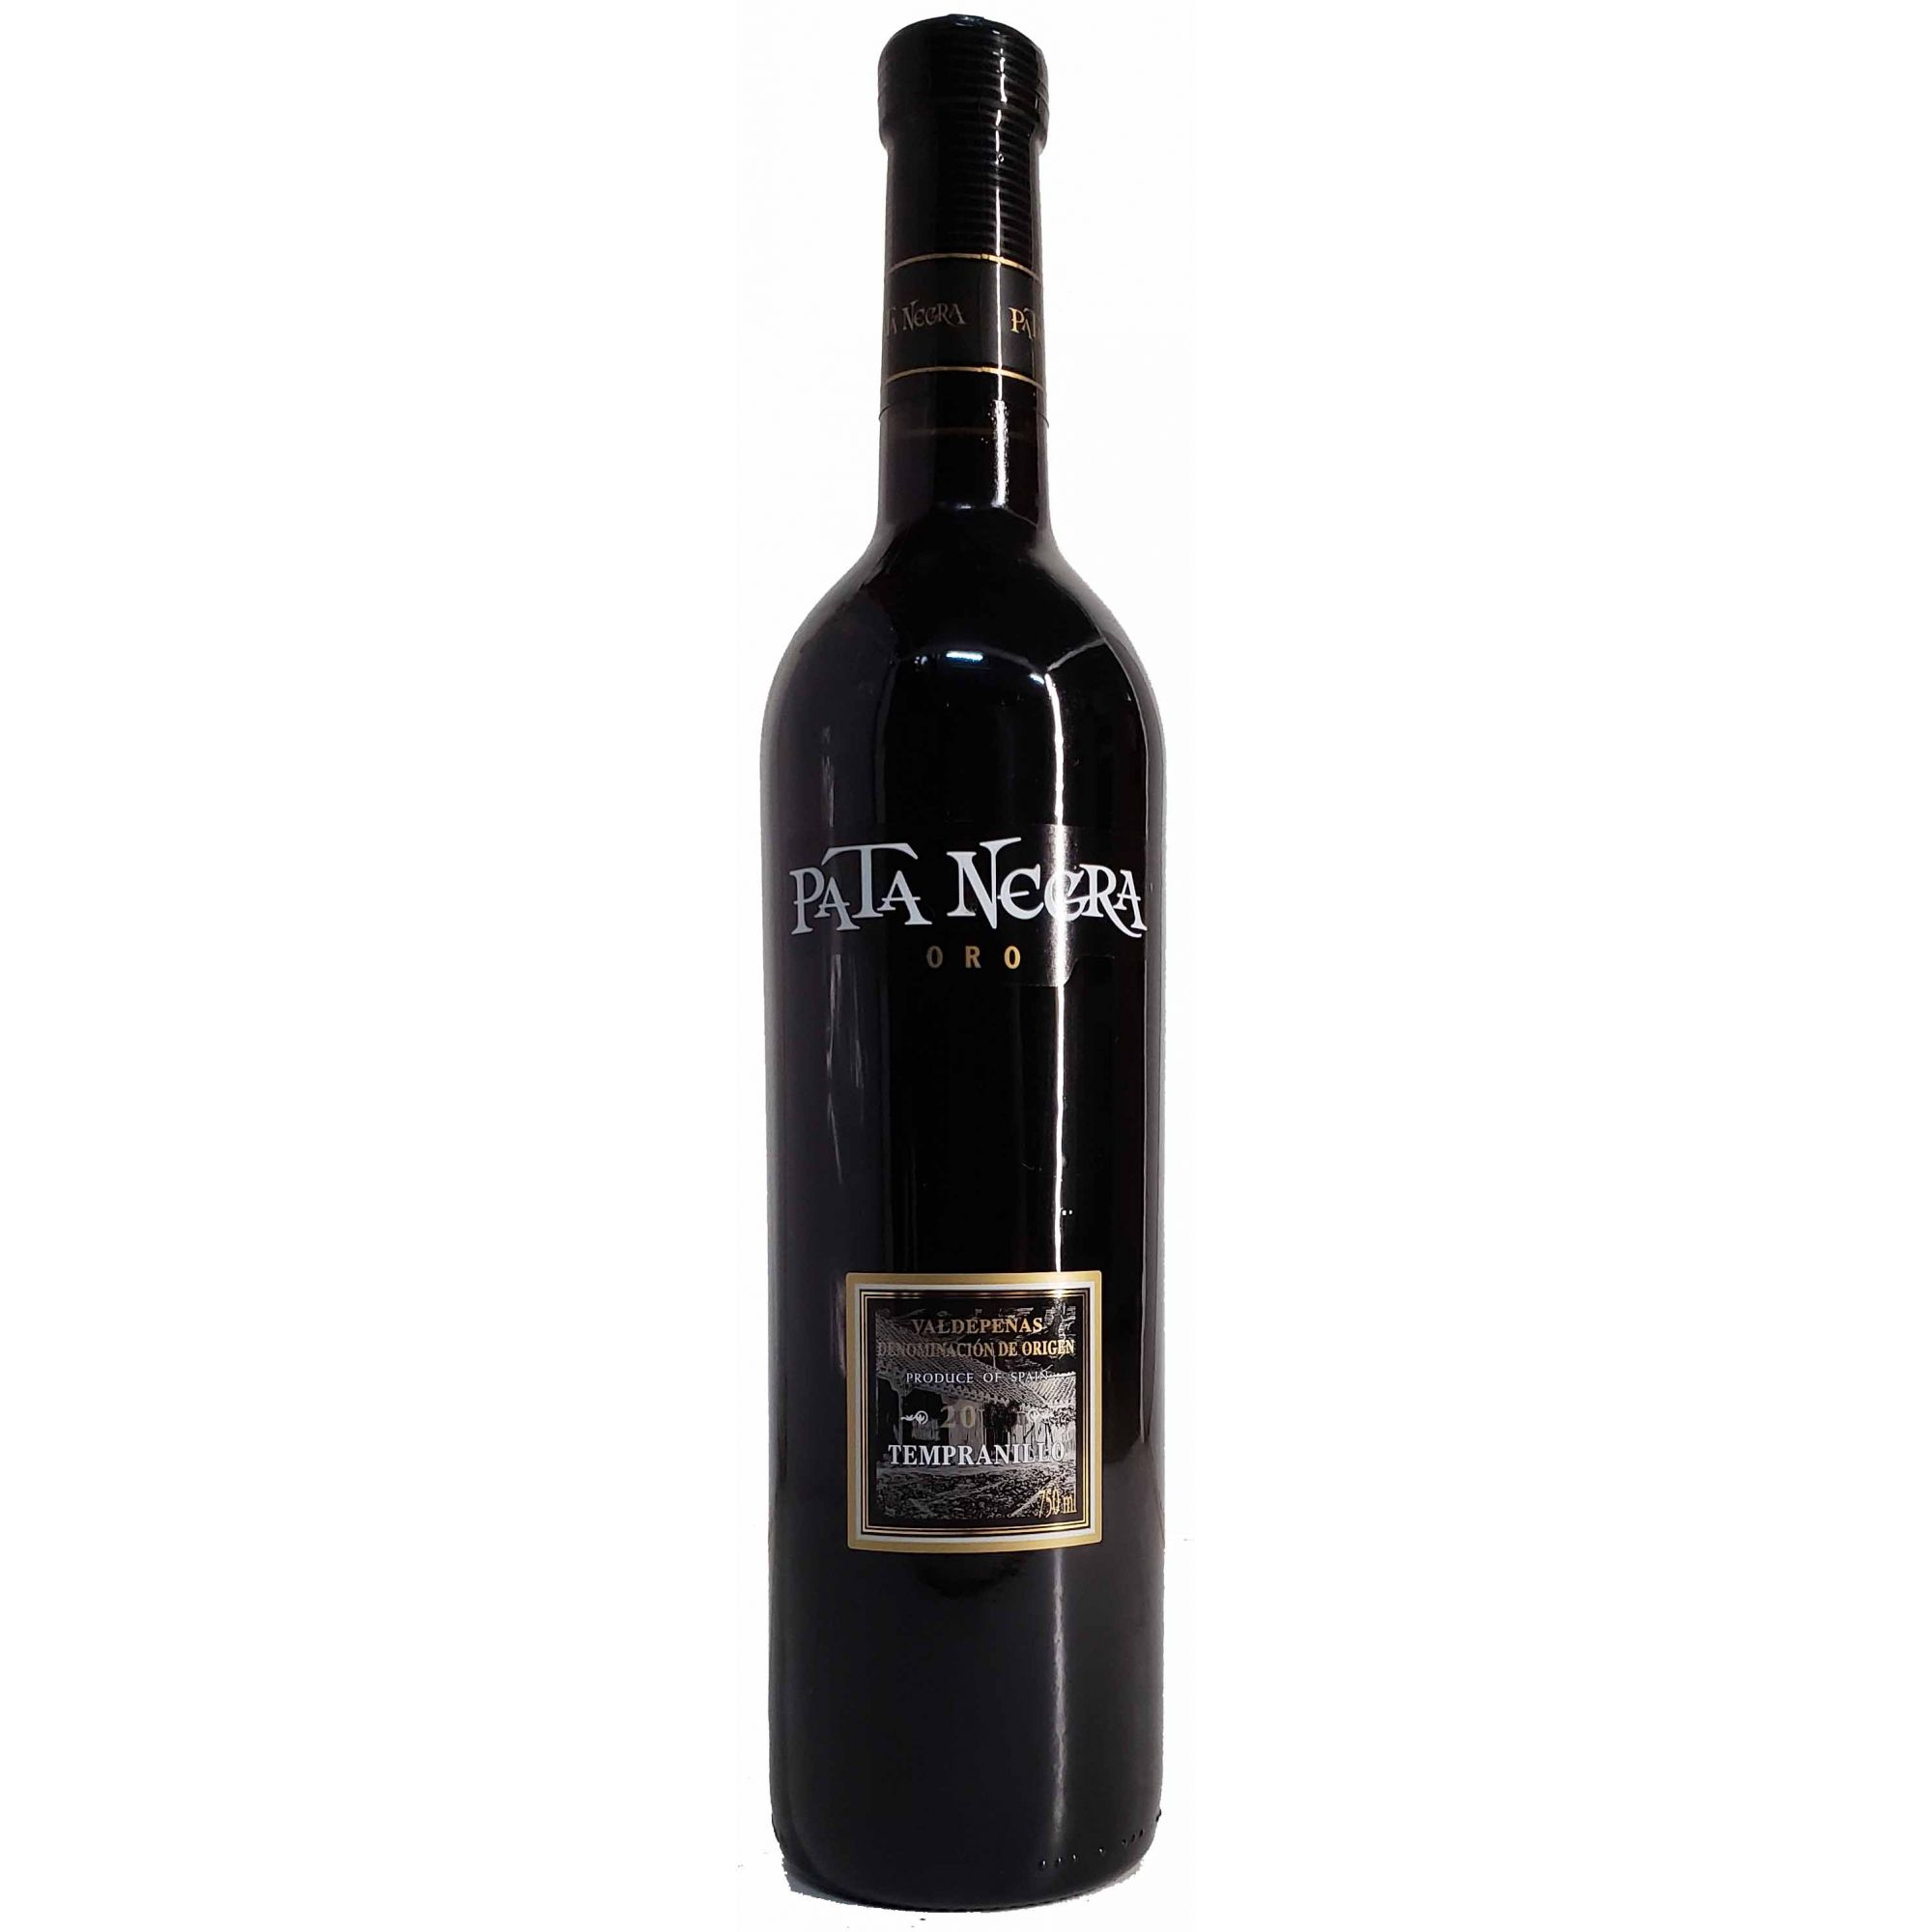 Vinho Pata Negra Oro Tempranillo Valdepenas DO - 750ml -